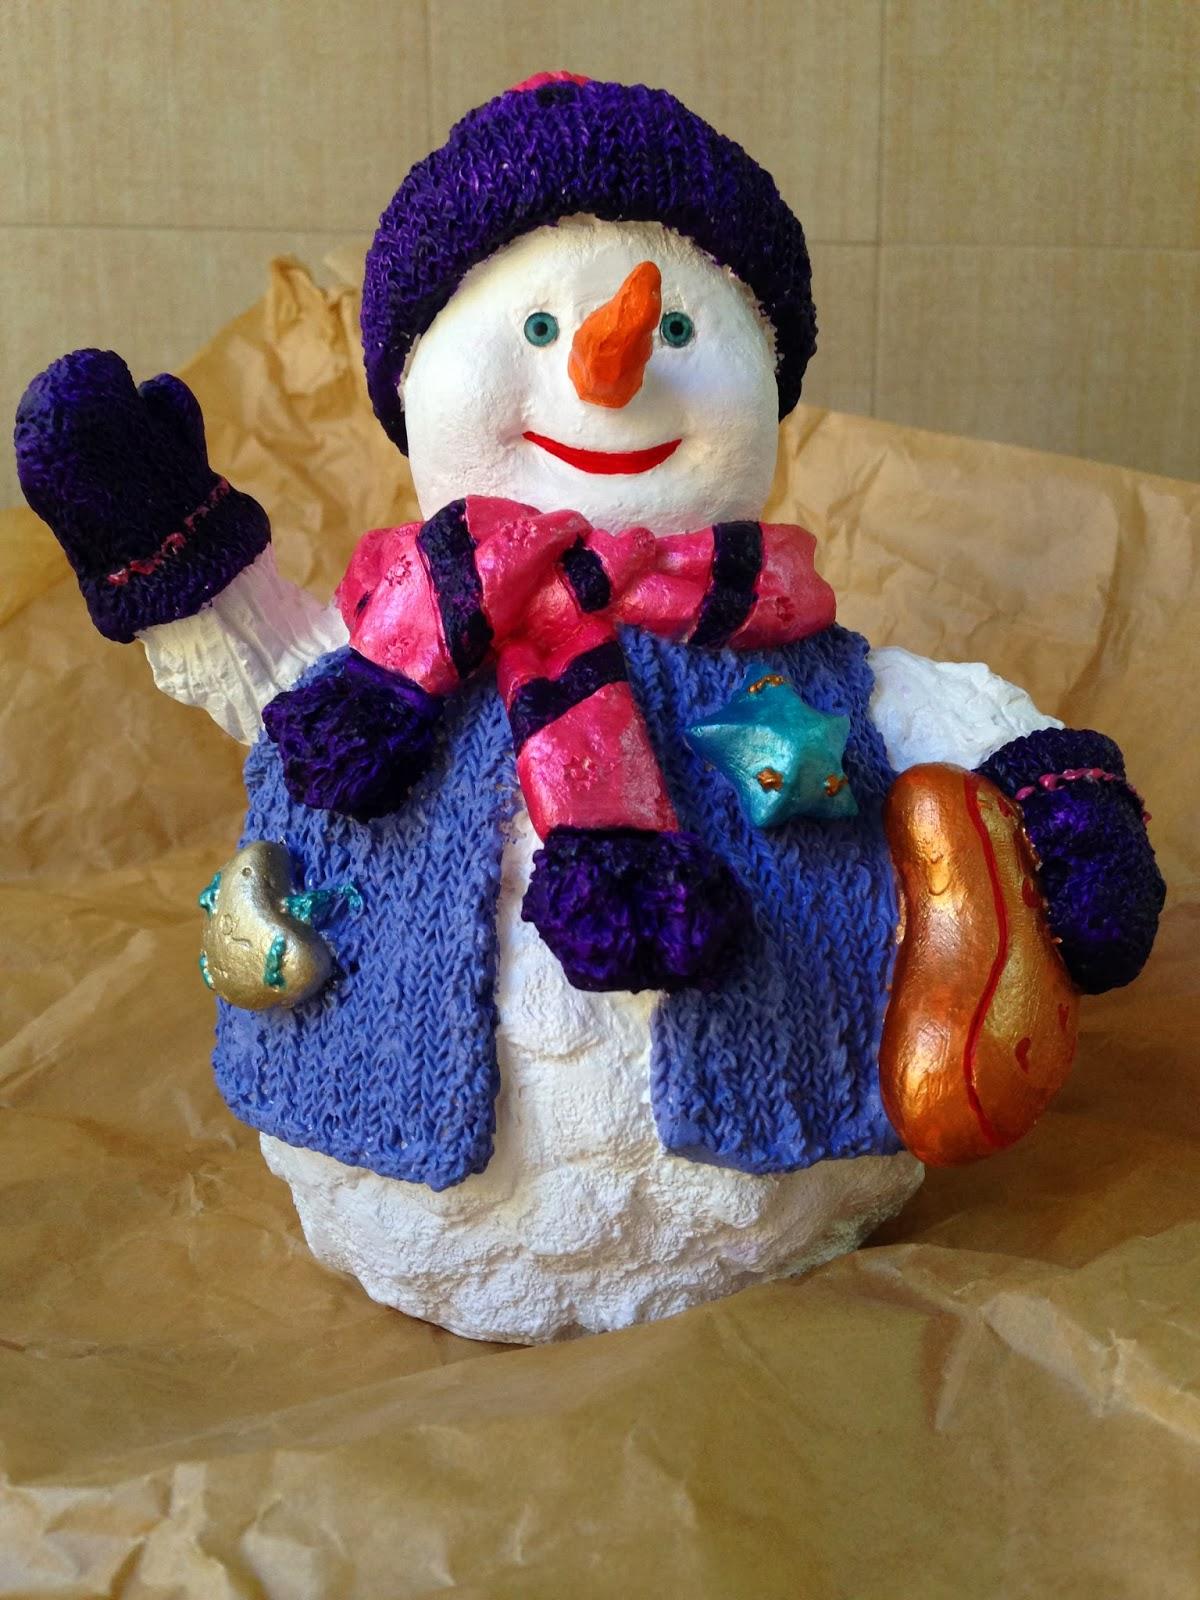 Las Manualidades de Yiya: Figuras de navidad para regalar pintadas a ...